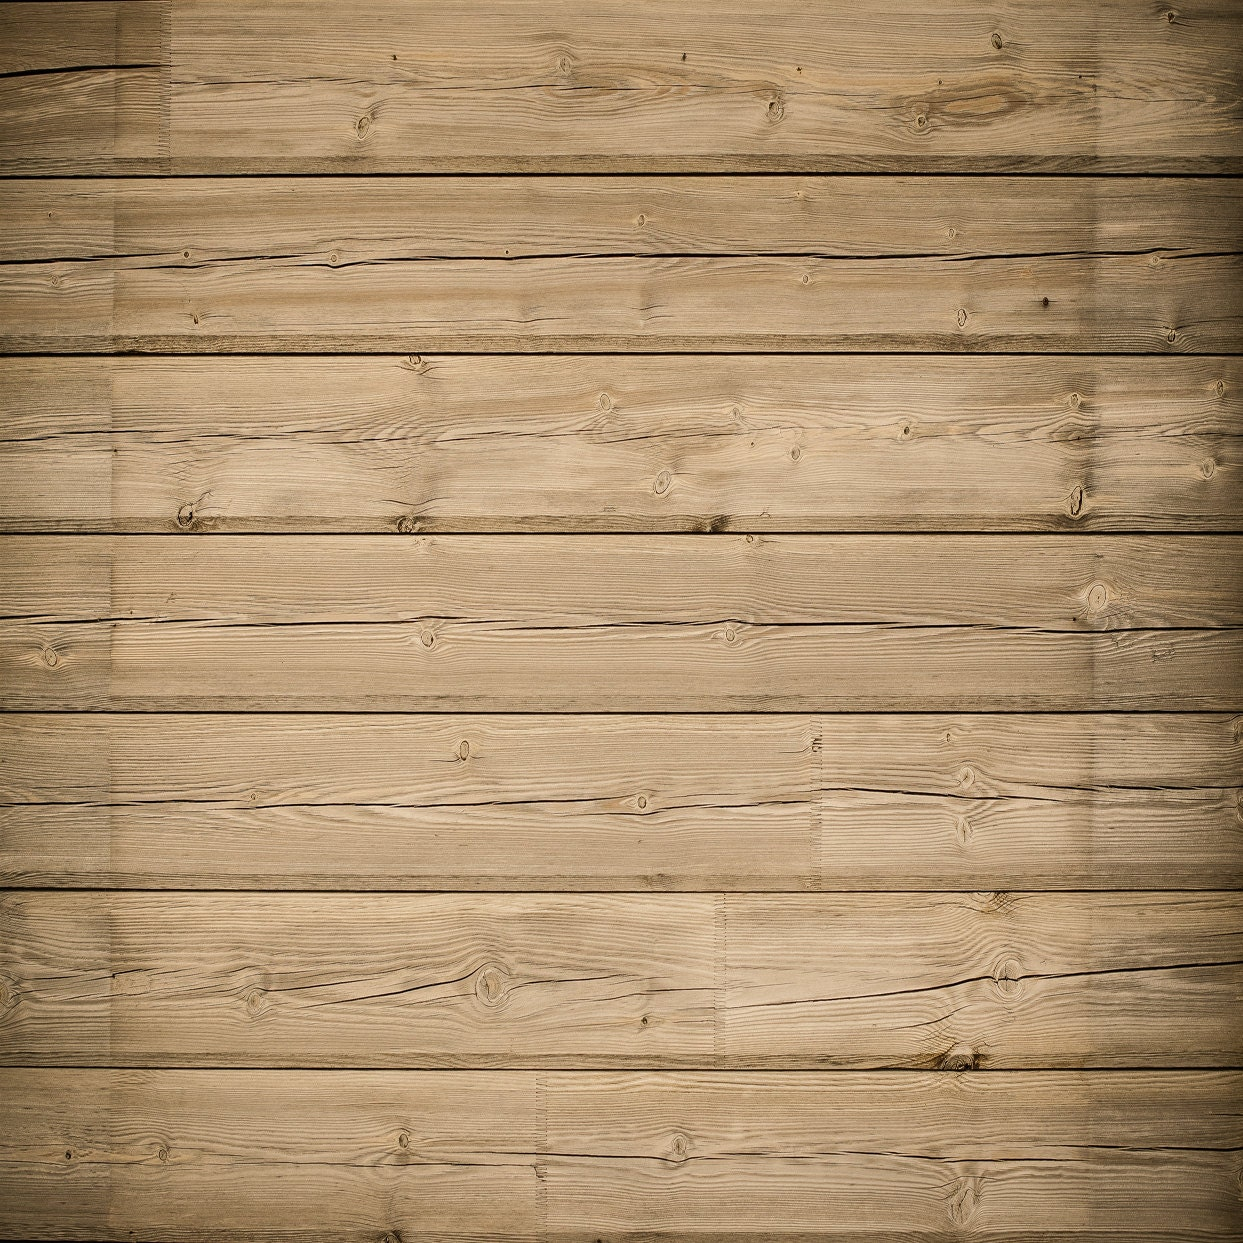 Vieja madera fondo piso de madera duela gris vintage